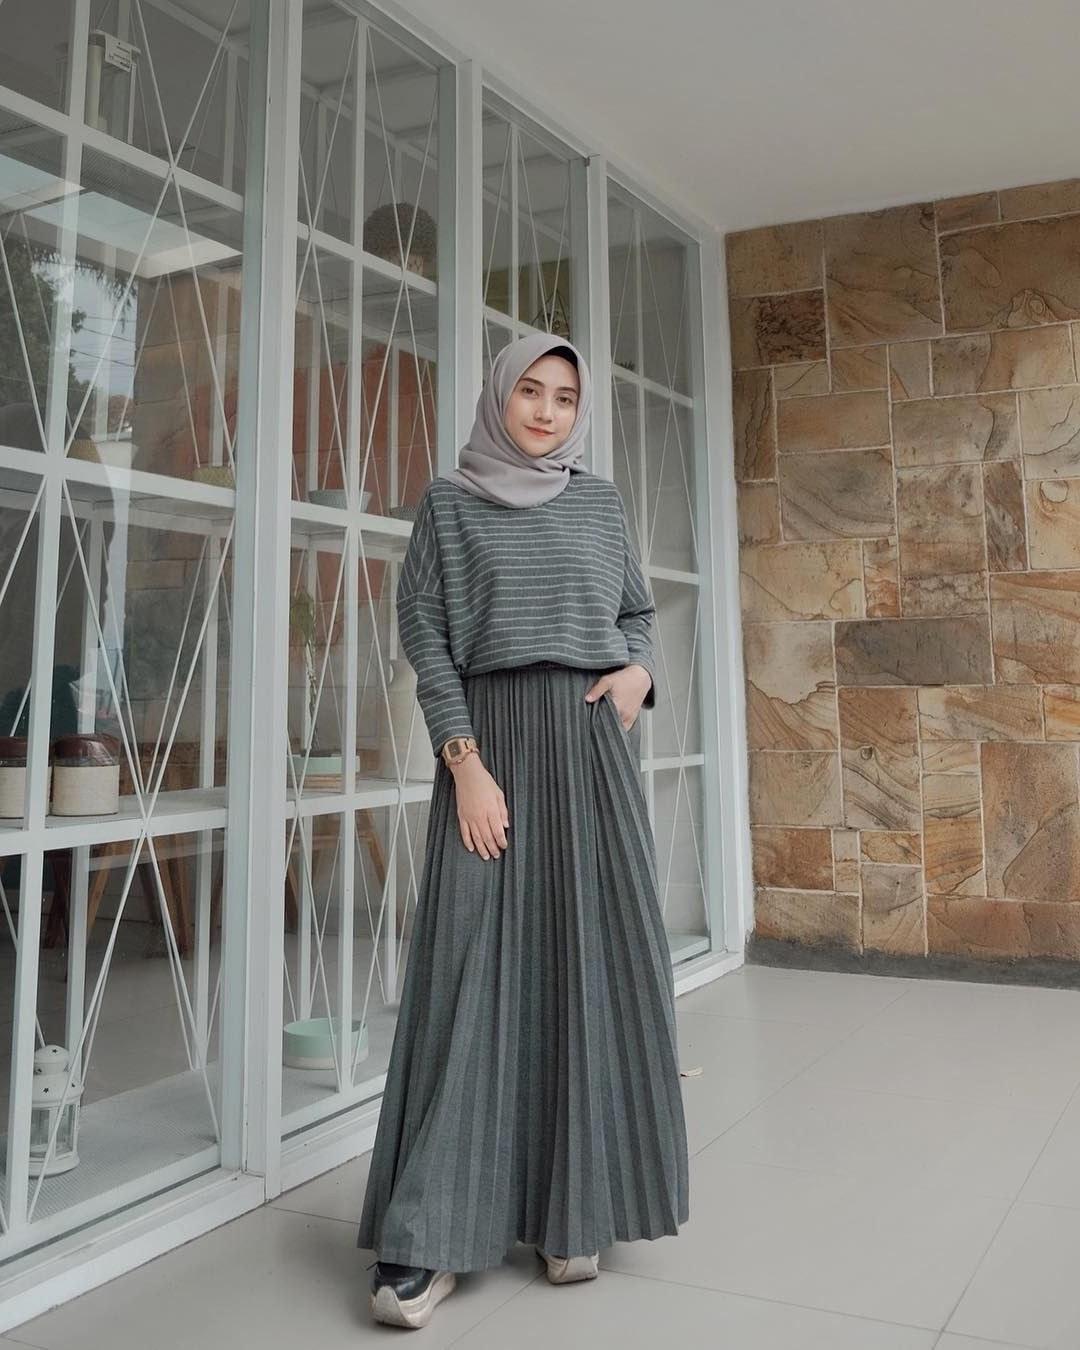 Design Model Baju Lebaran Wanita 2019 Mndw Baju Muslim Lebaran Terbaru 2019 Dengan Gambar